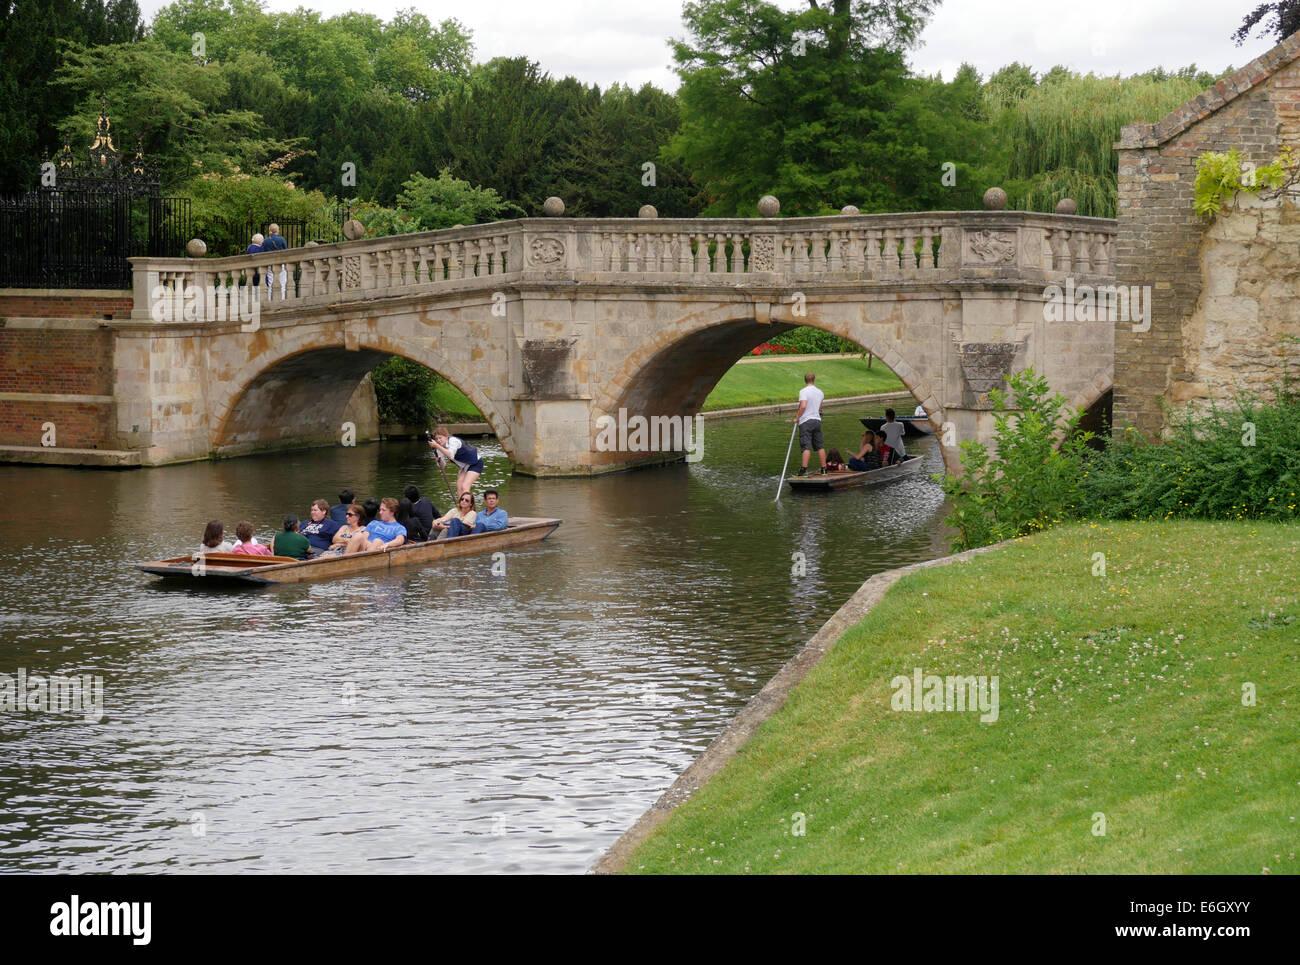 College life - punts on the River Cam near Cambridge University, Cambridge England - Stock Image